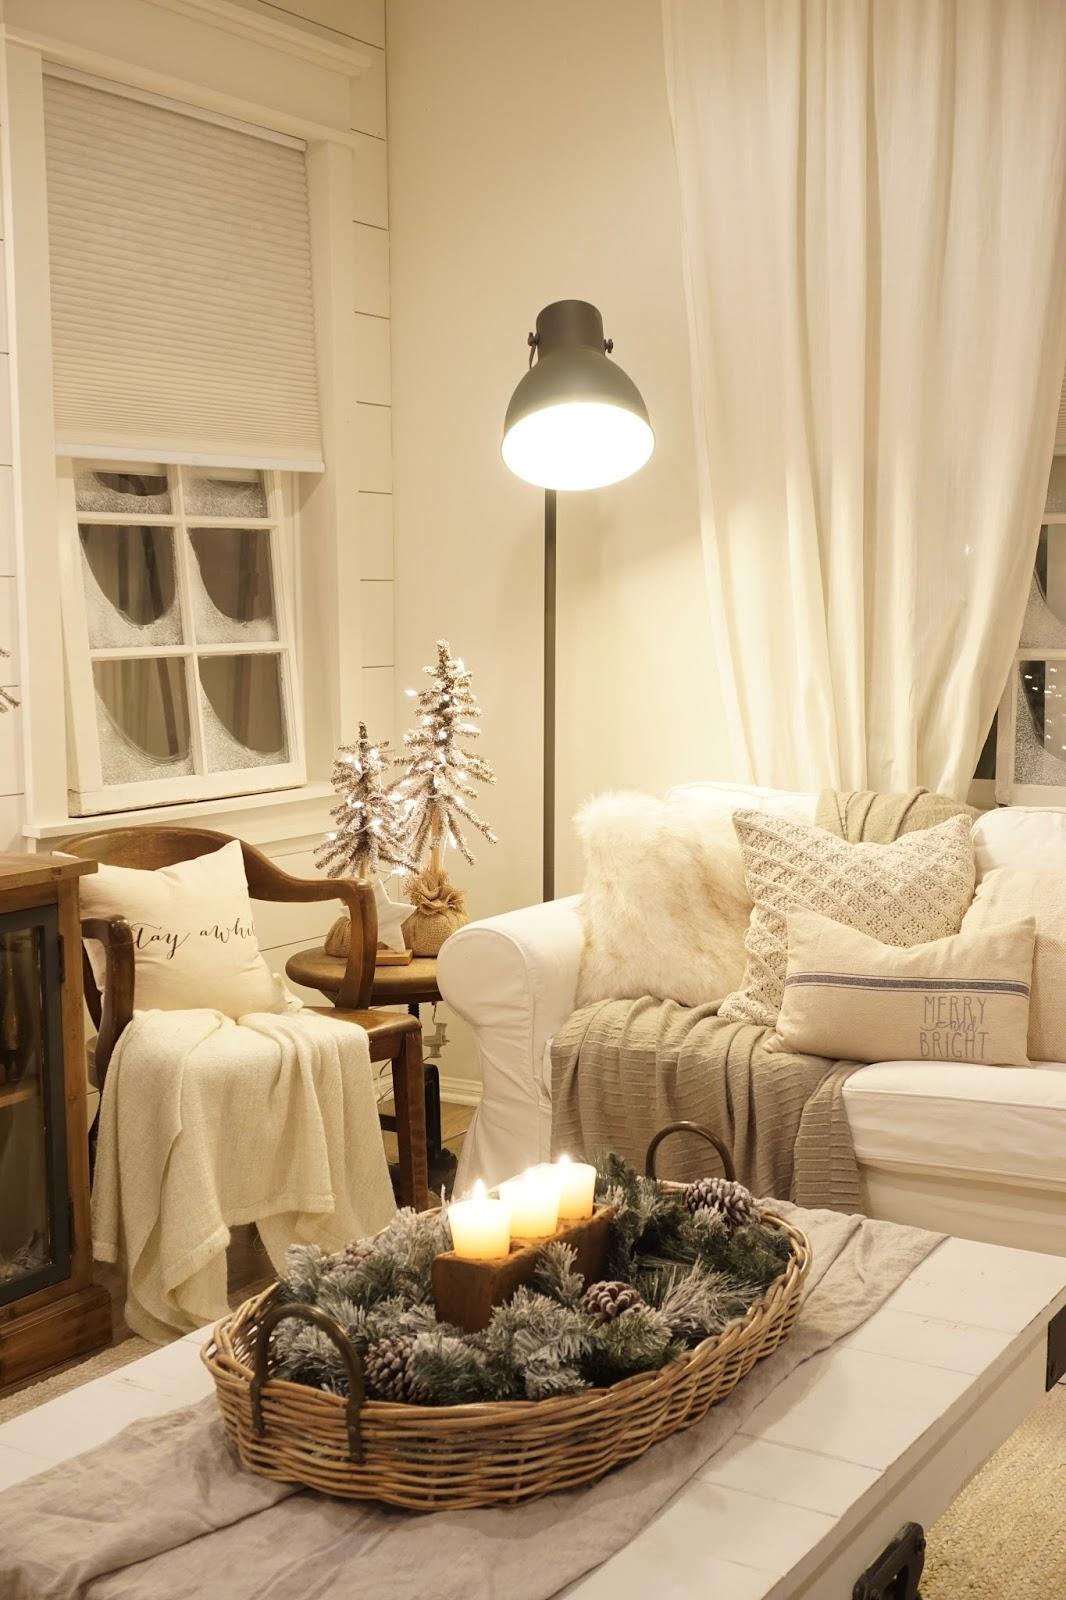 Cozy Christmas Living Room Night Tour - Mrs Rollman Blog on